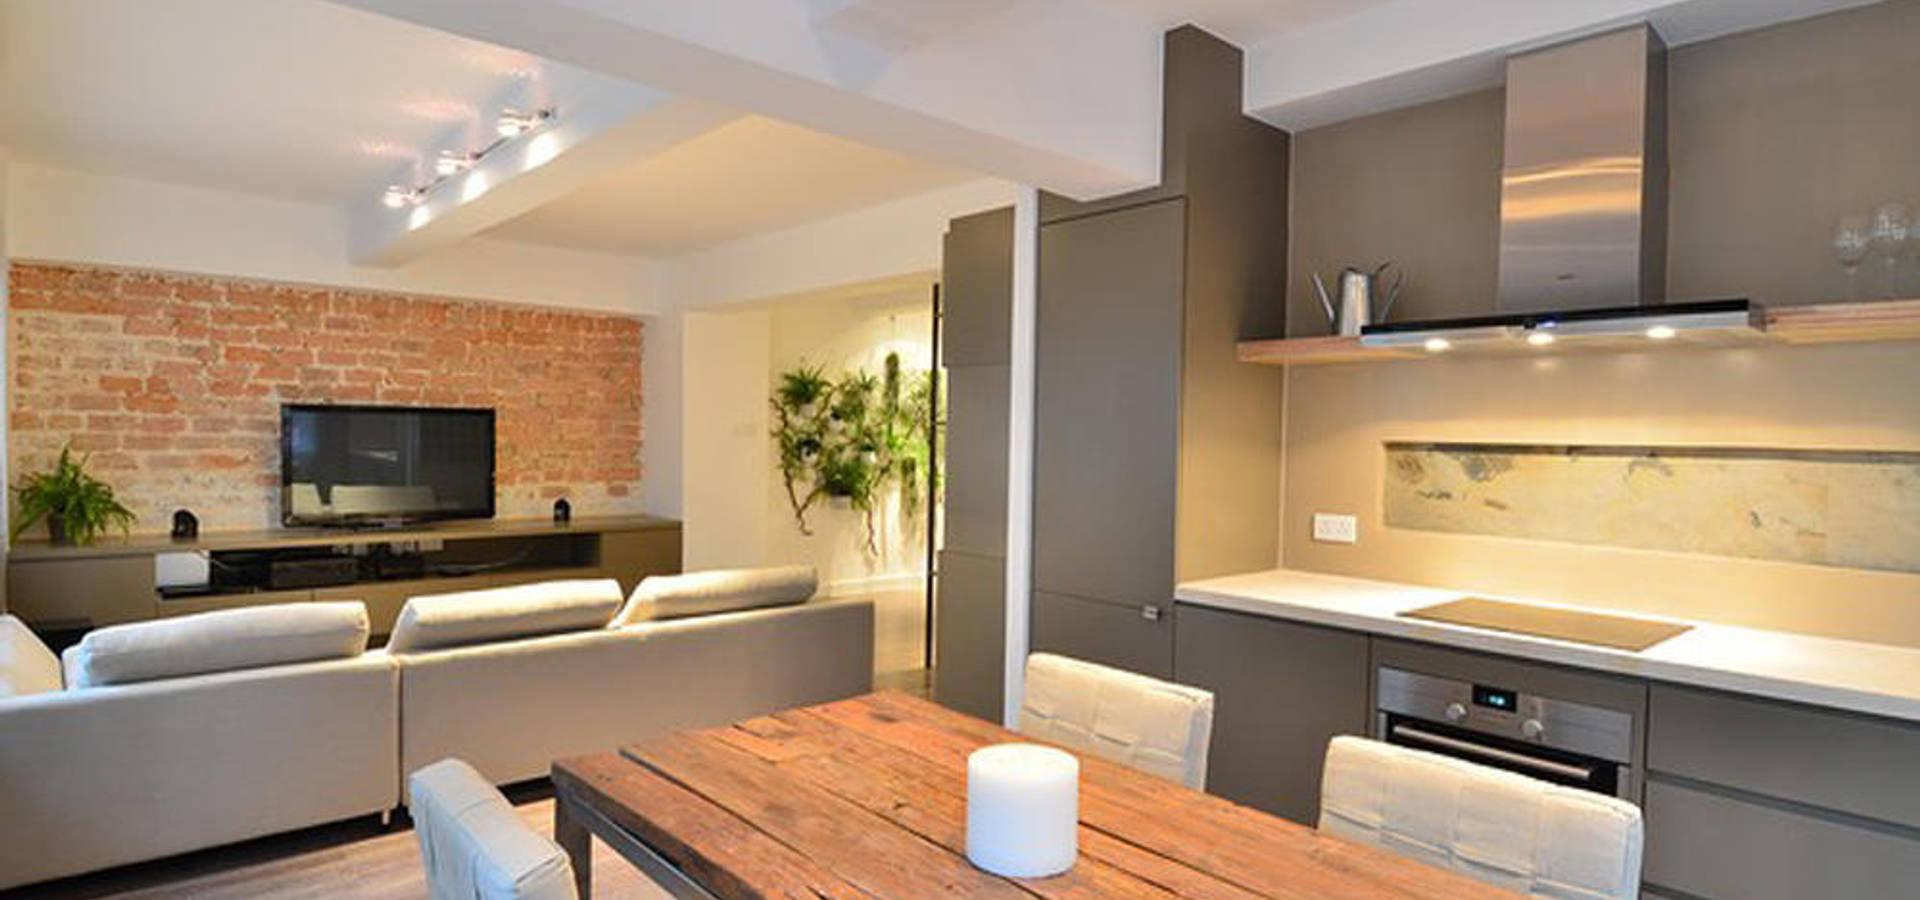 Newton Concepts Furniture & Interior Design